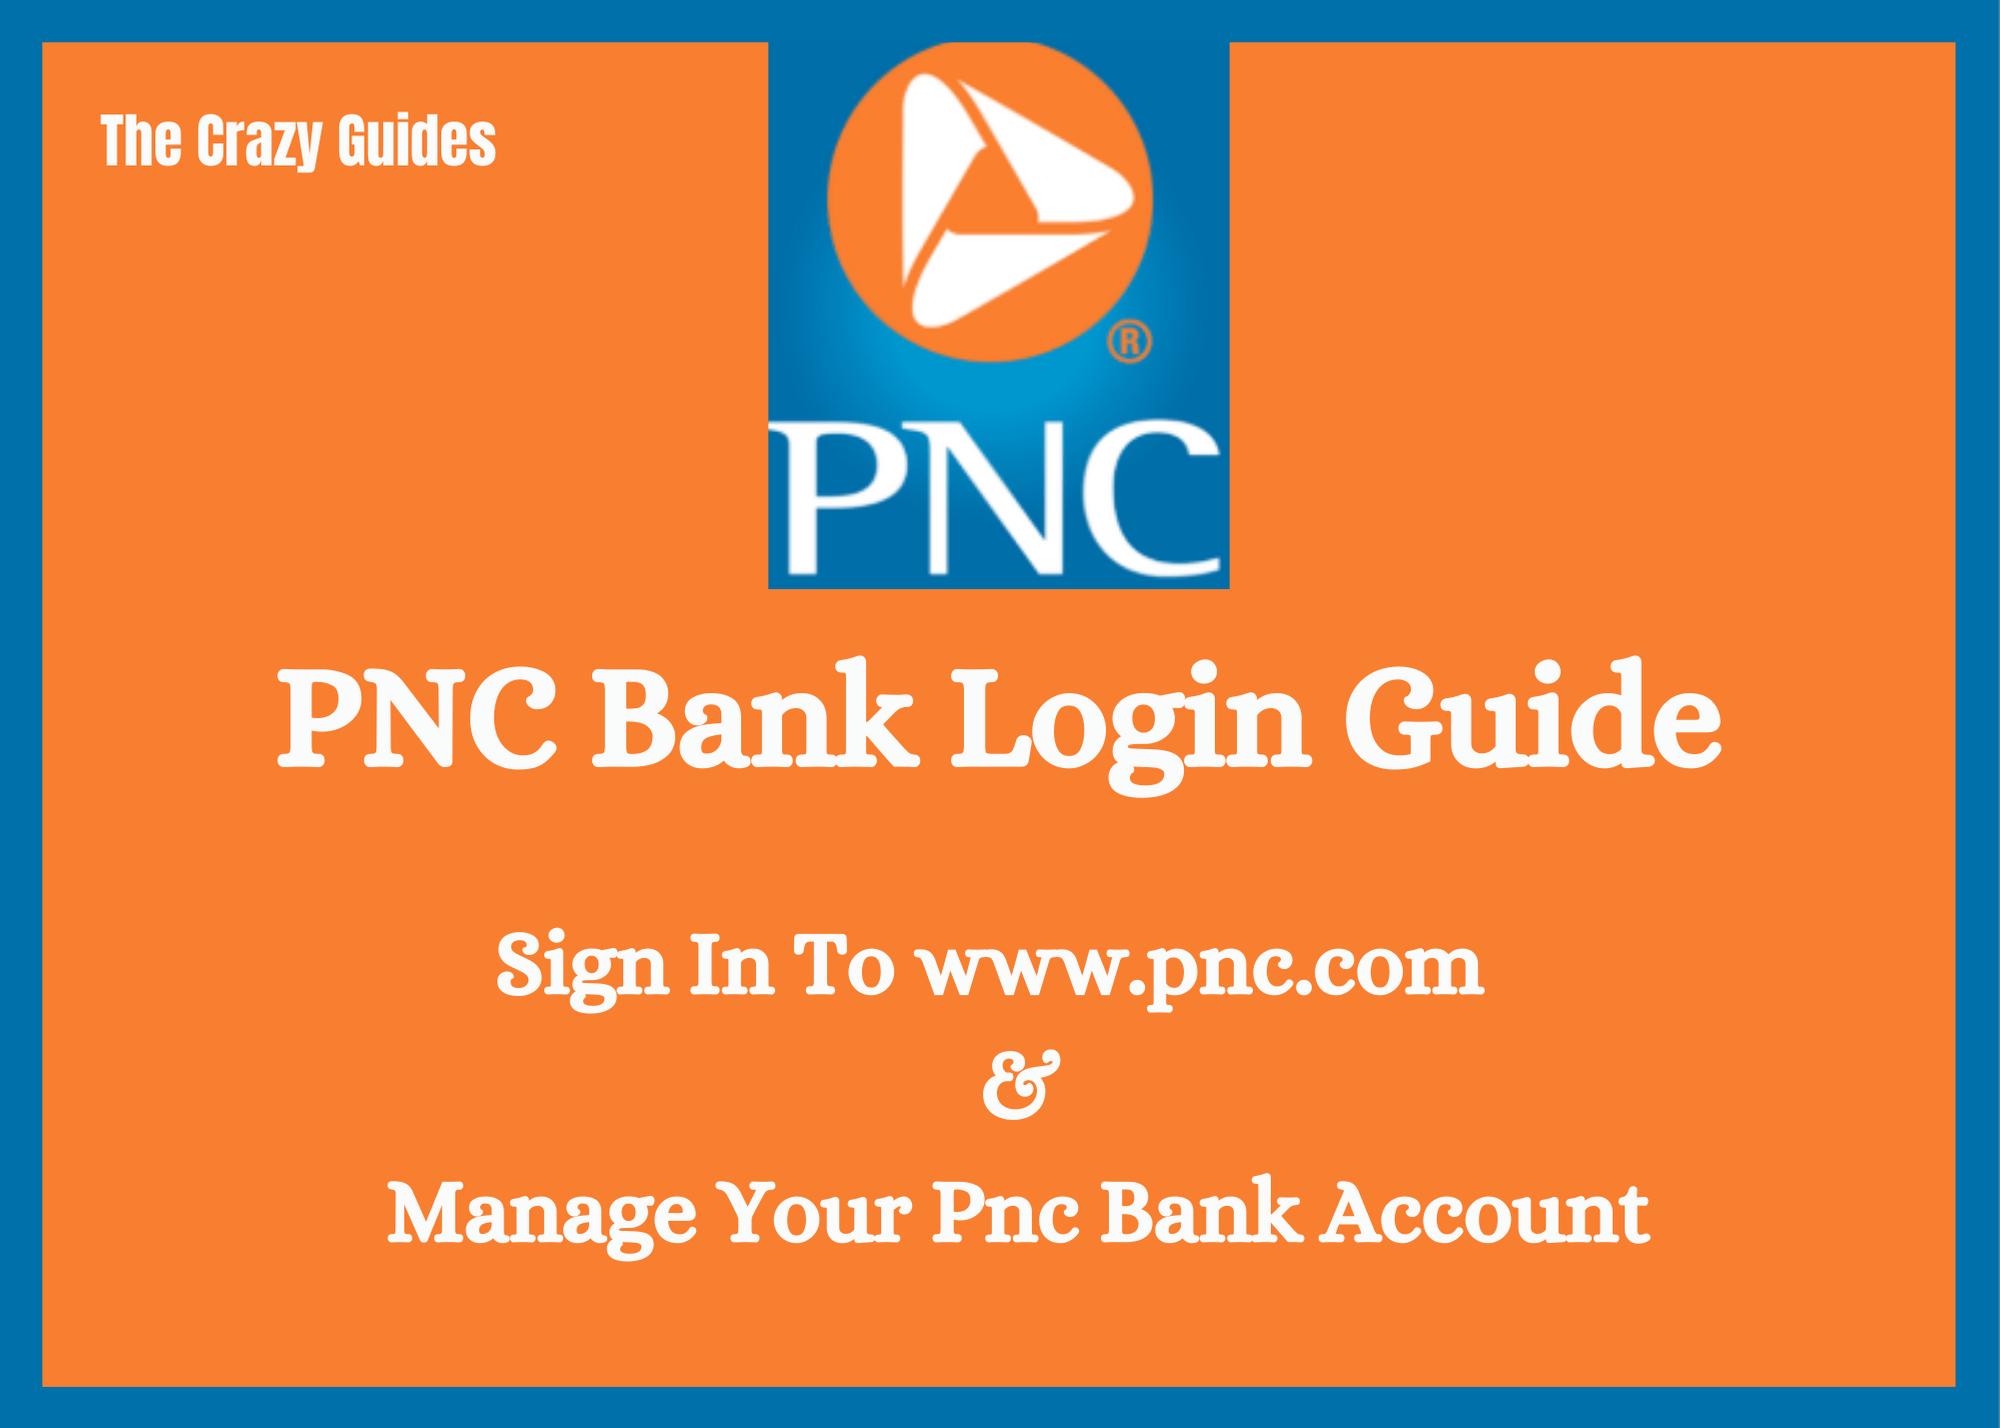 Pnc online banking login